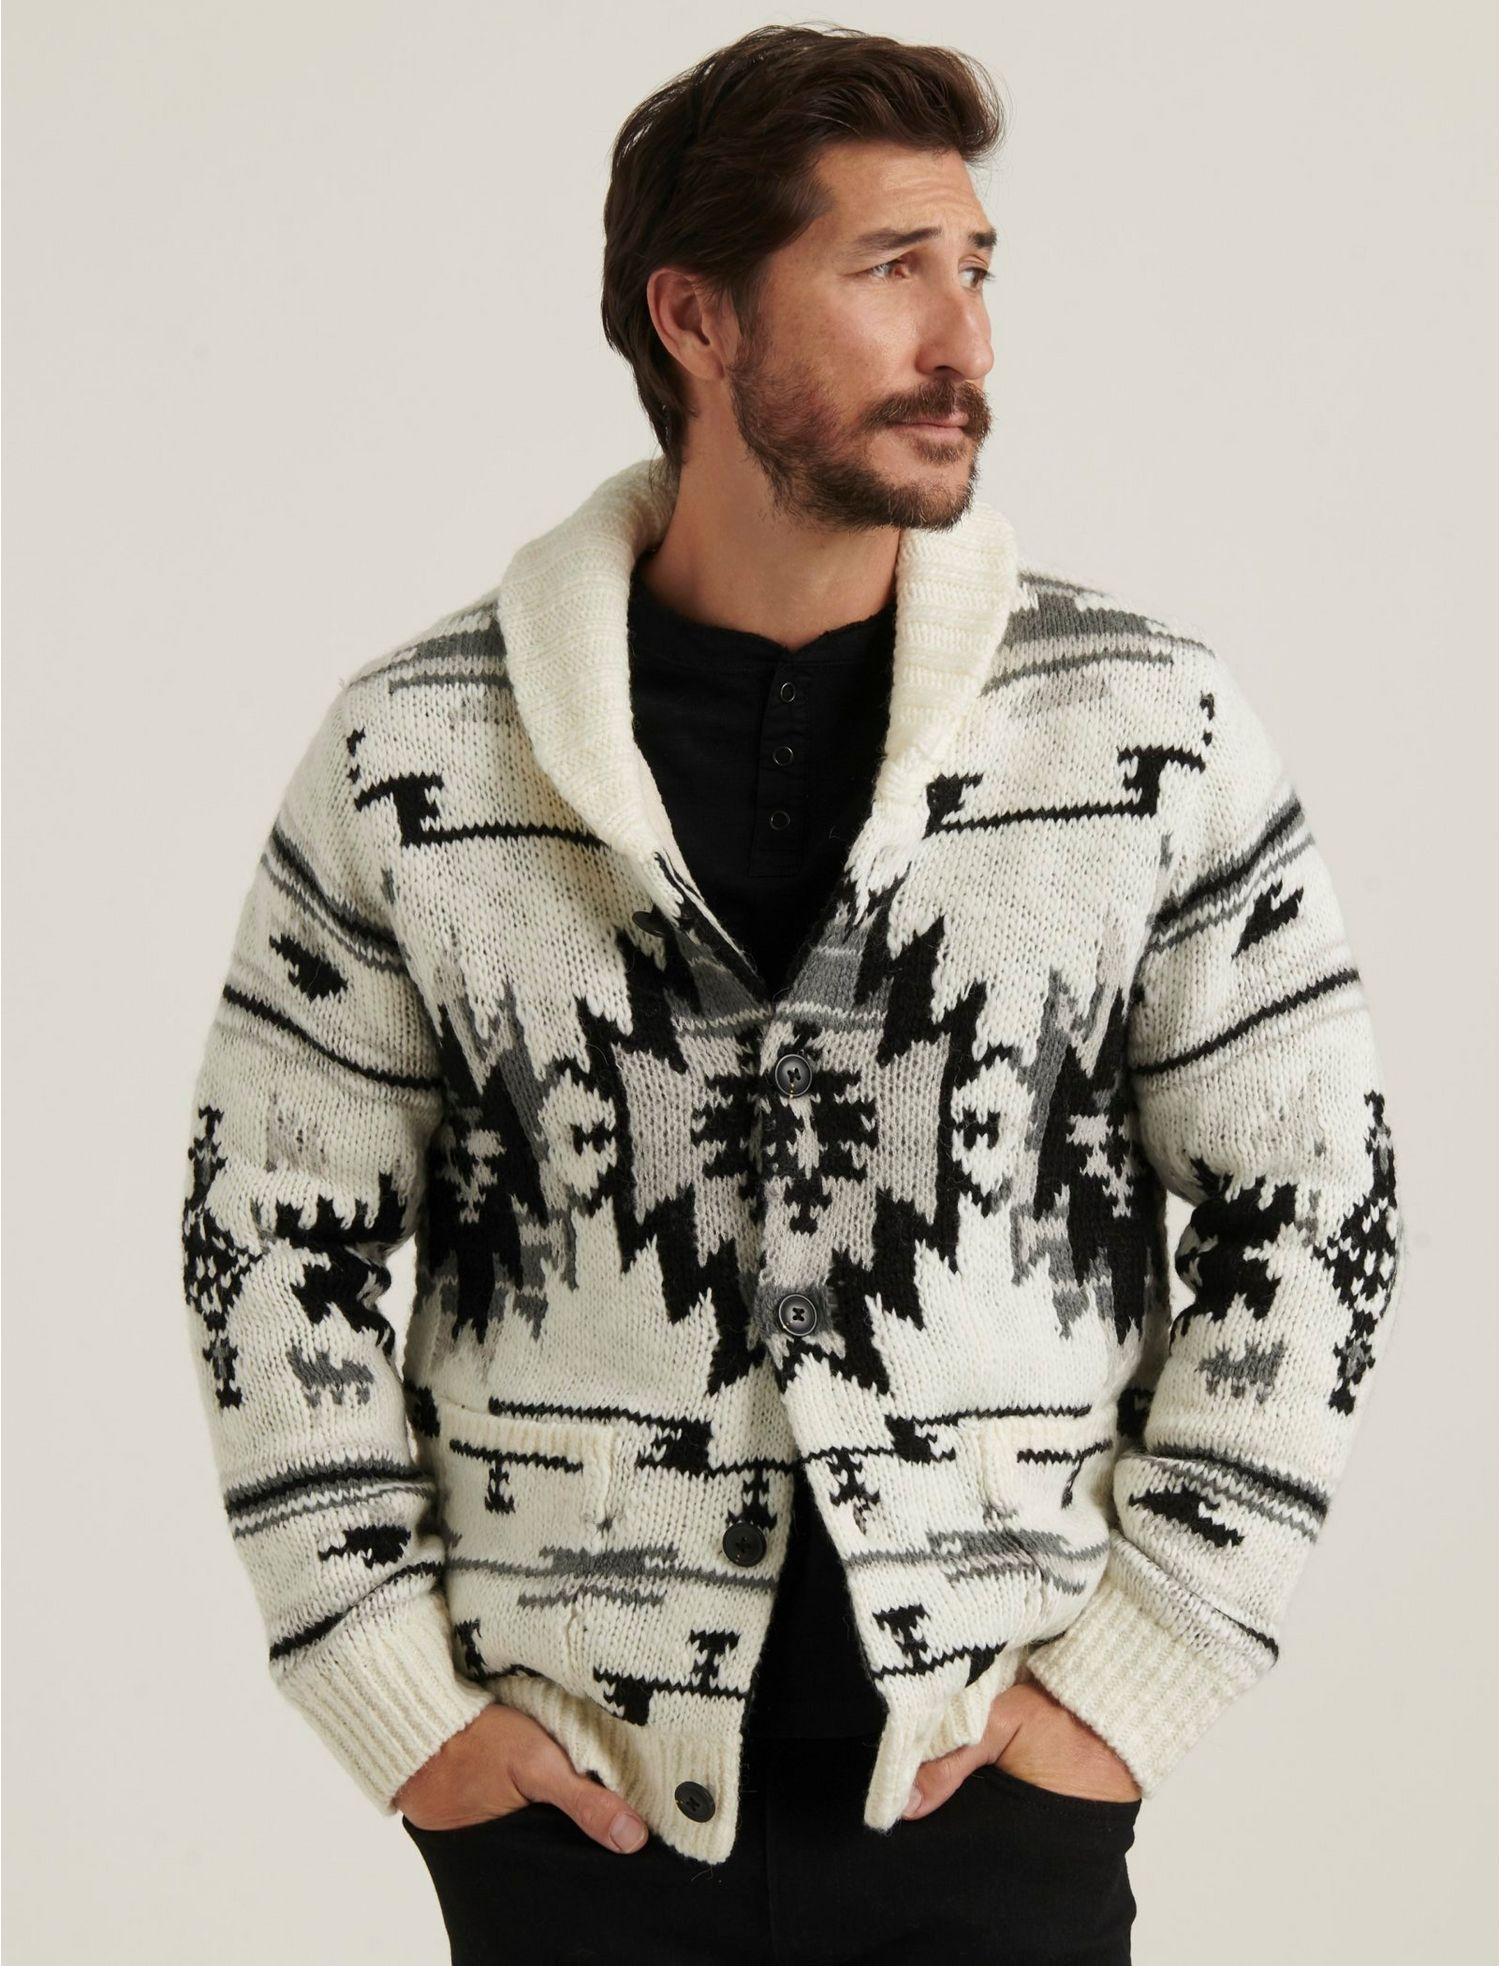 Lucky Brand Men's Southwestern Sherpa Lined Shawl Cardigan